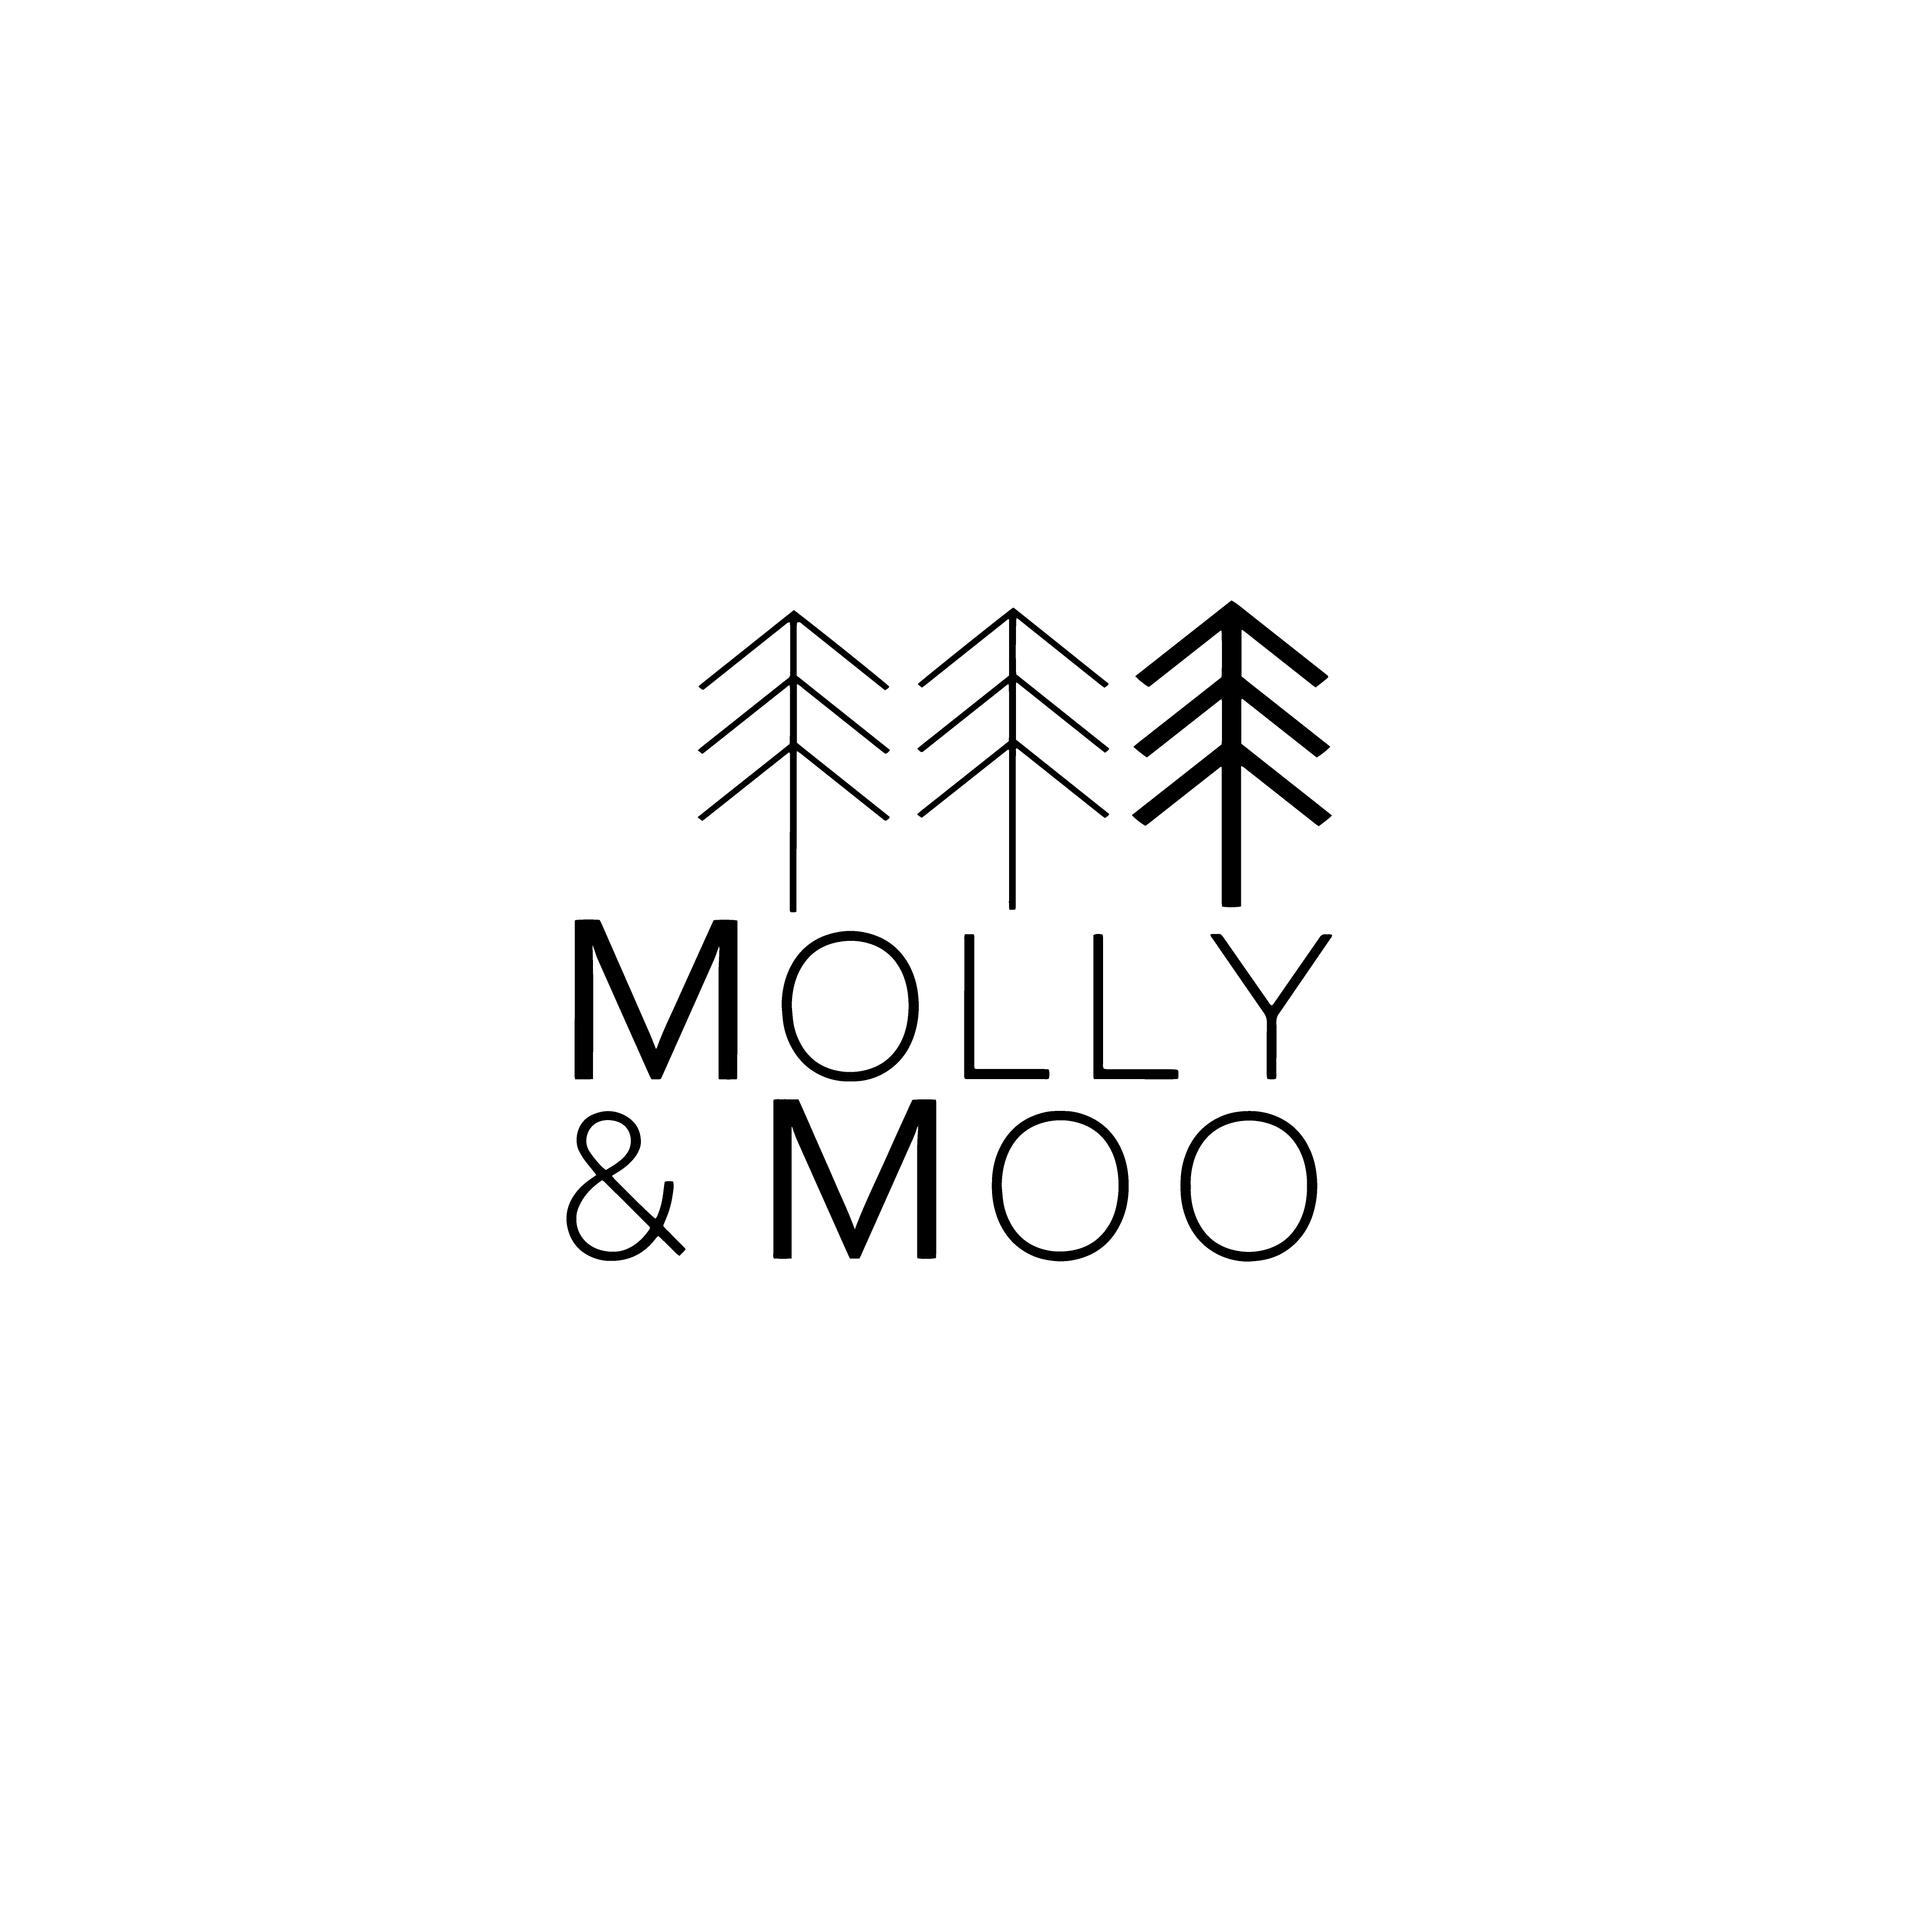 Molly & Moo Branding | Brand Identity Design by Fresh Leaf Creative | Dorset Brand Designer & Photographer